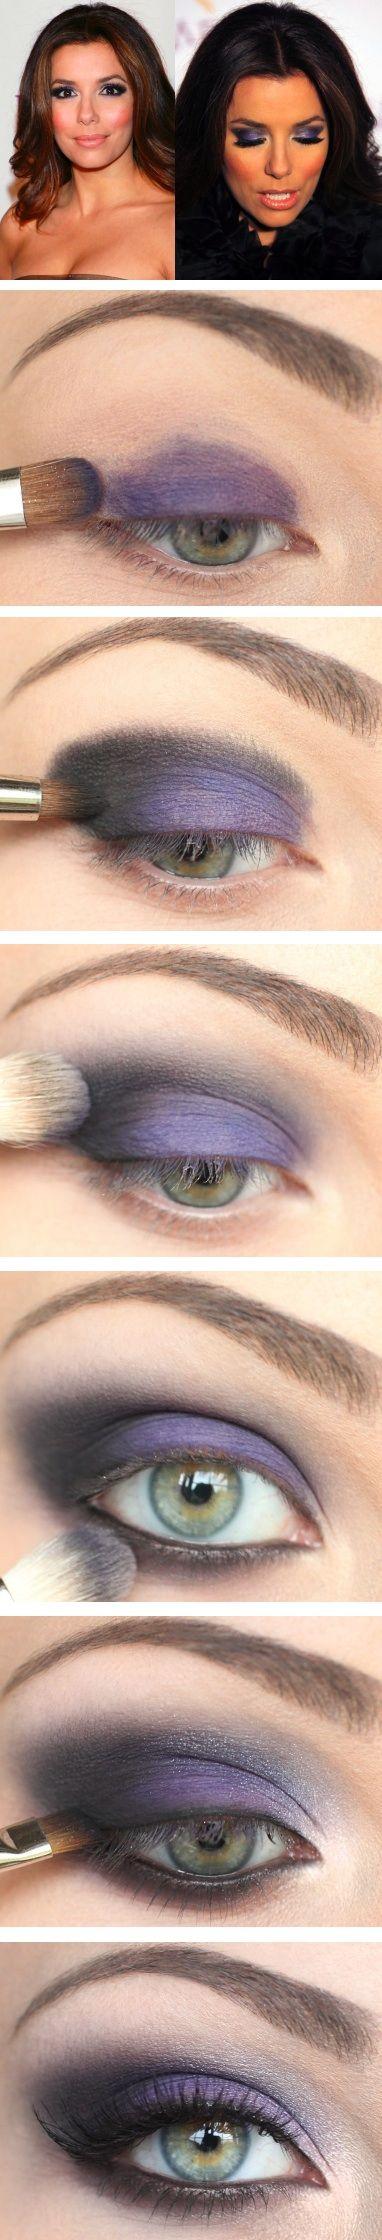 Eva longoria inspired look violets purples smokey makeup love